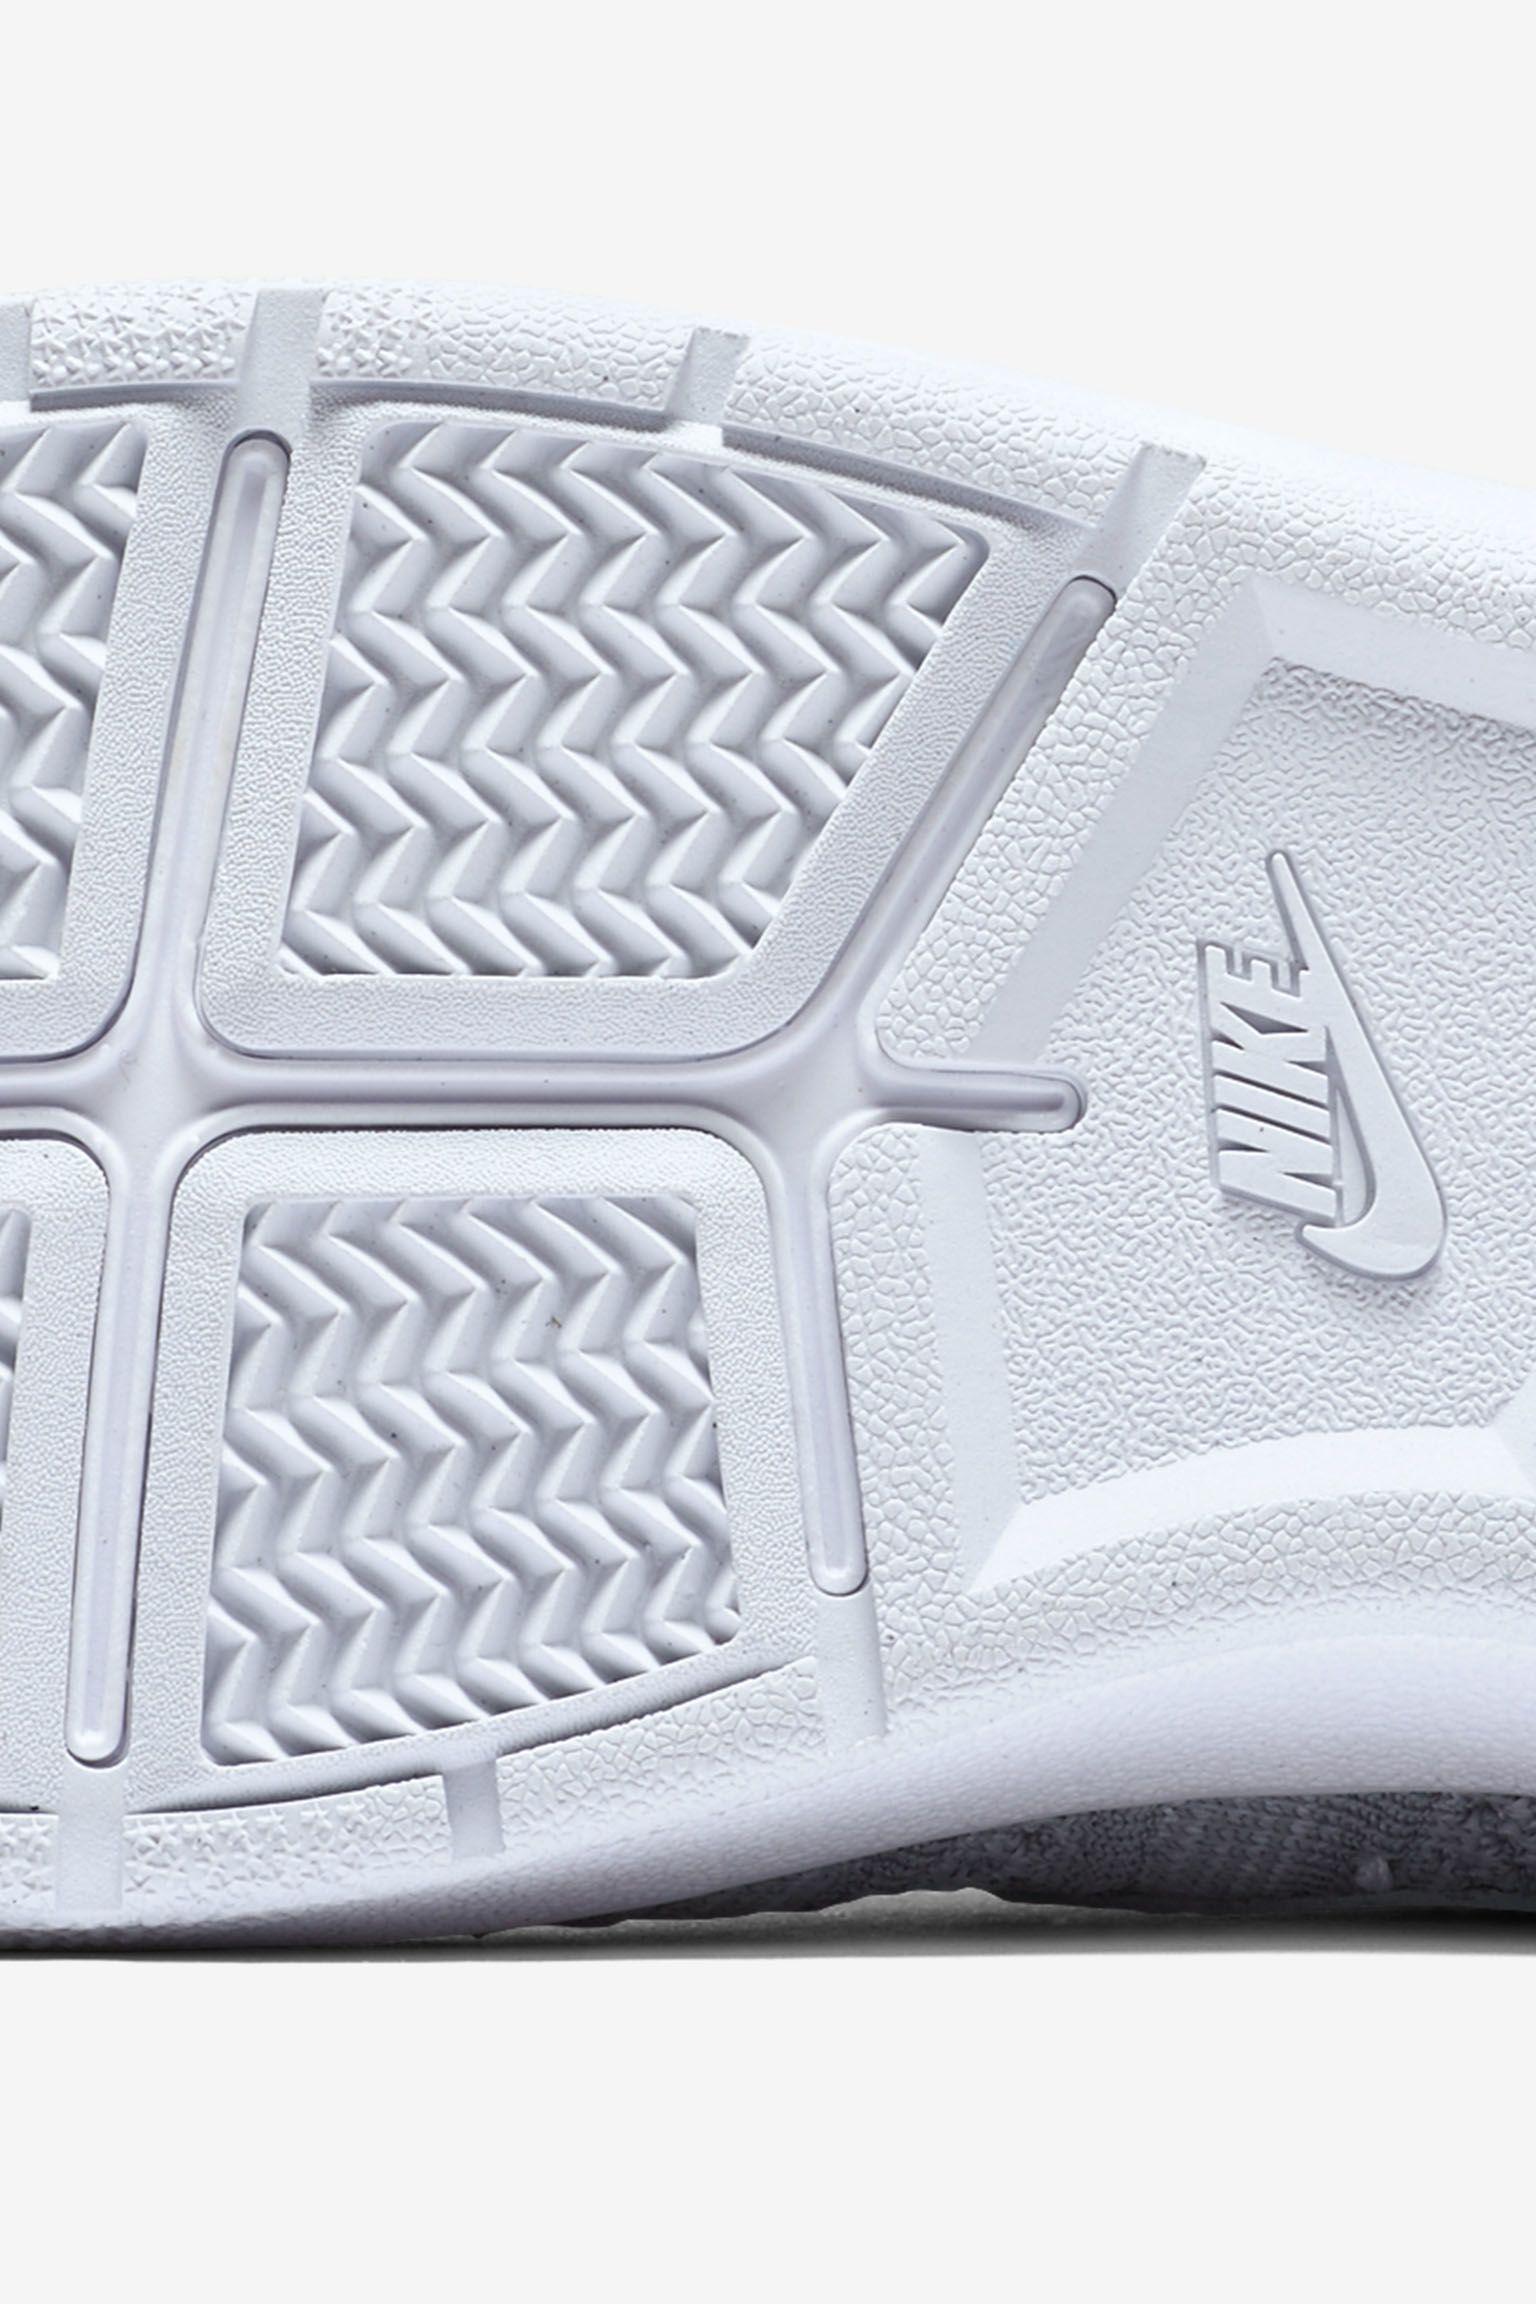 Nikecourt Tennis Classic Ultra Flyknit 'Wolf Grey'